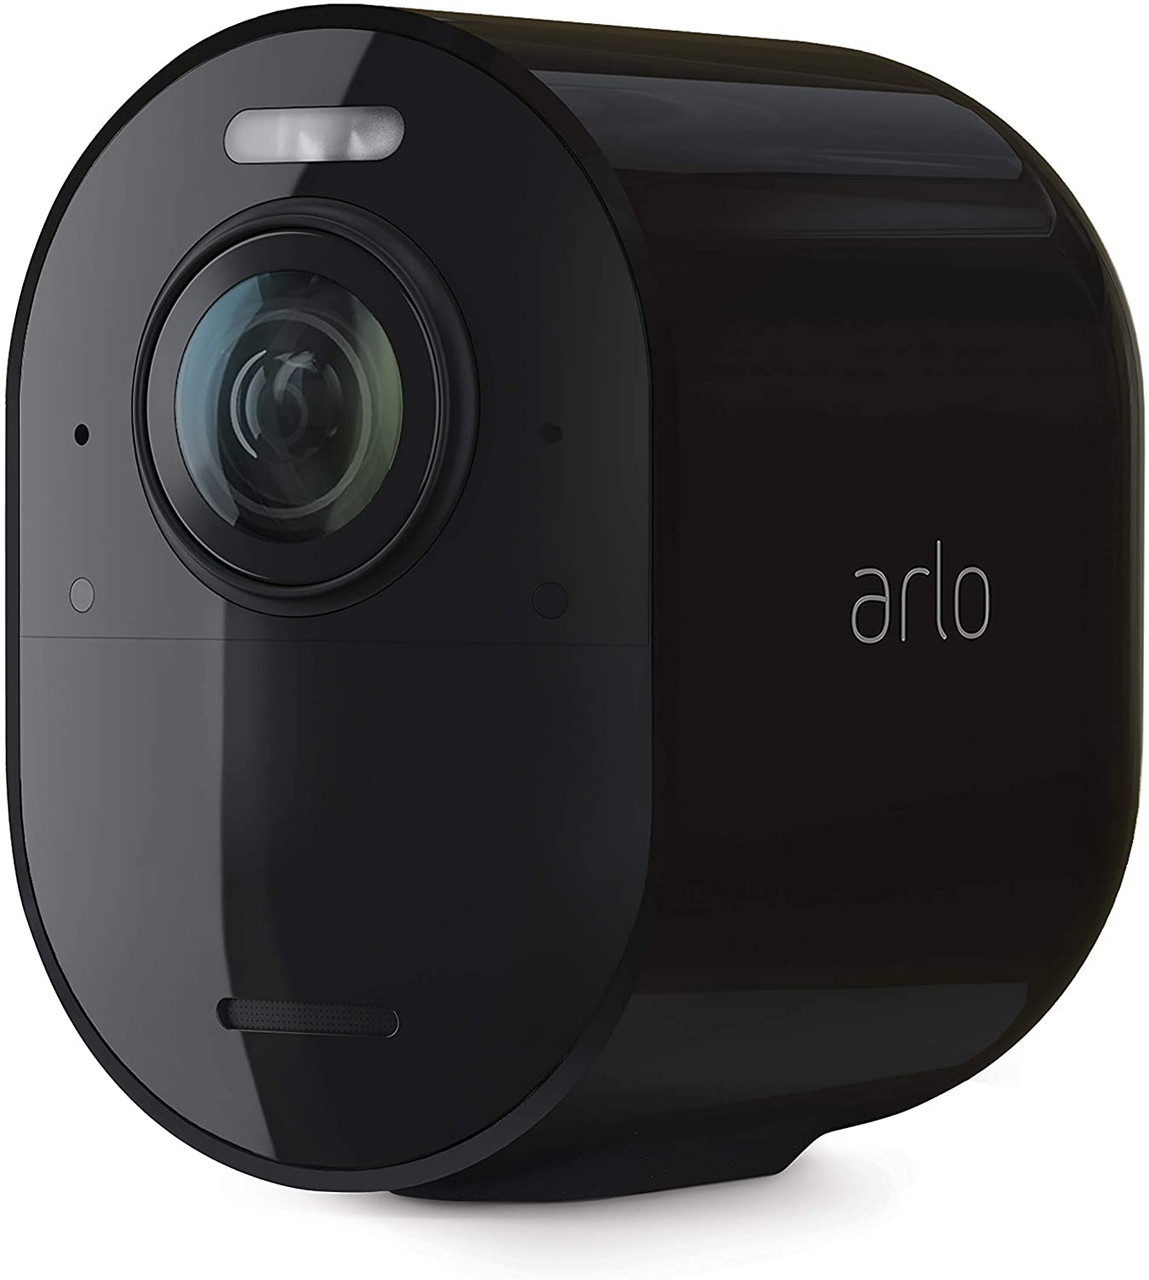 ARLO VMS5240B-100NAR 4K Ultra 2-Camera Security Camera System, Black – Certified Refurbished